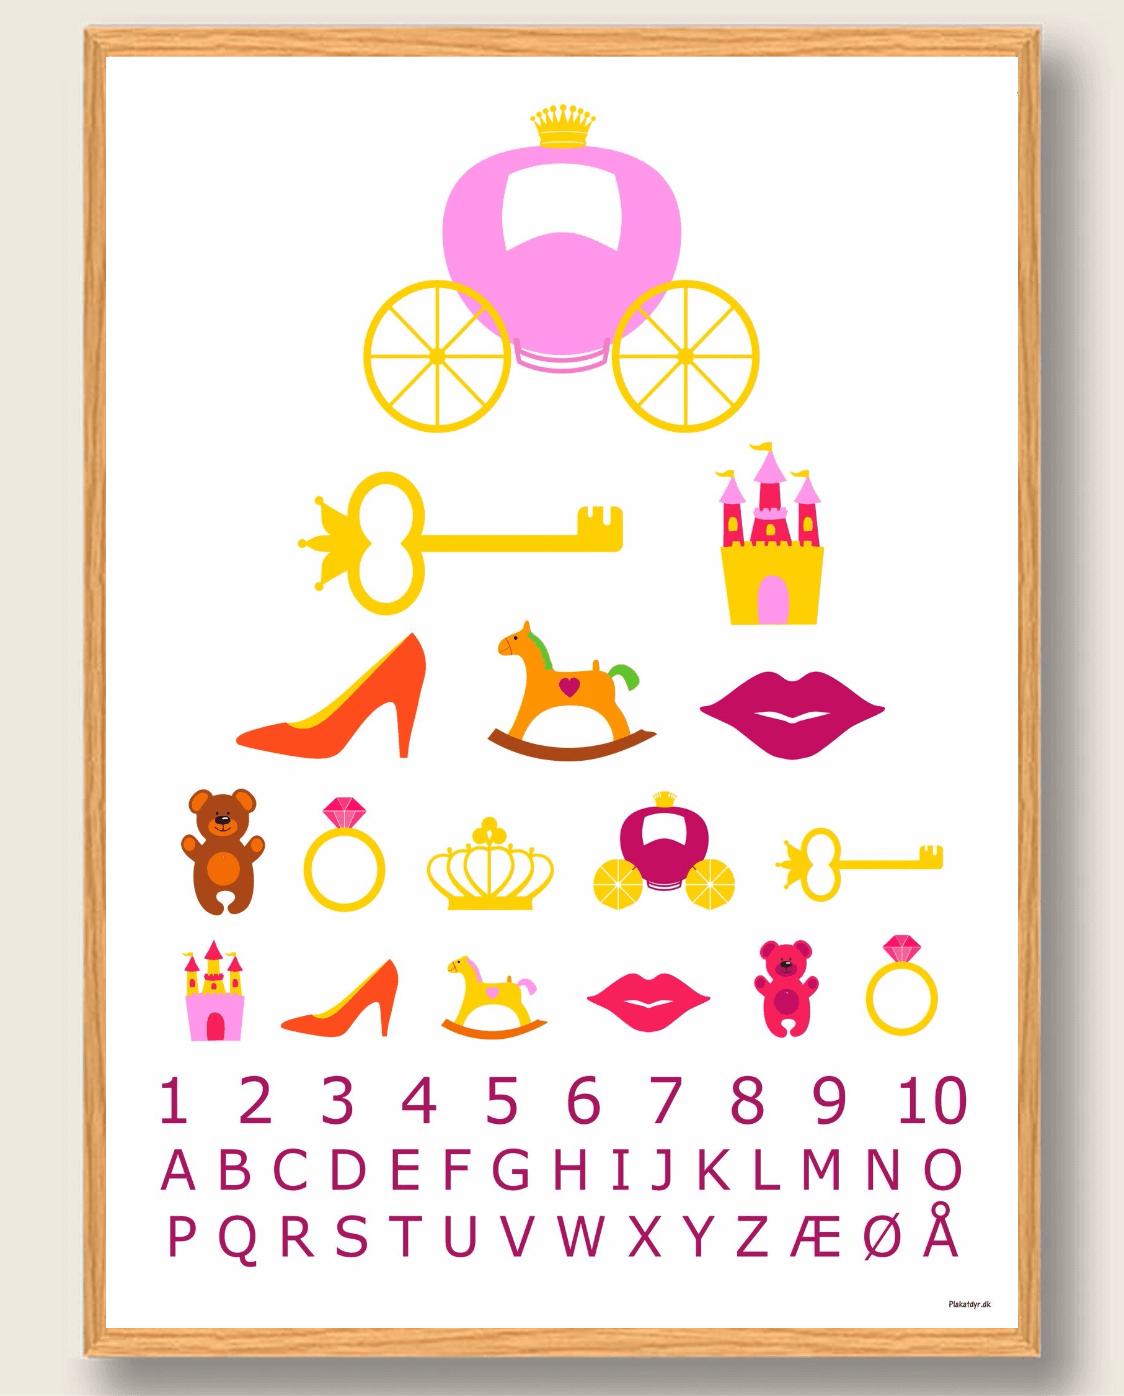 Synstavle prinsesse - plakat